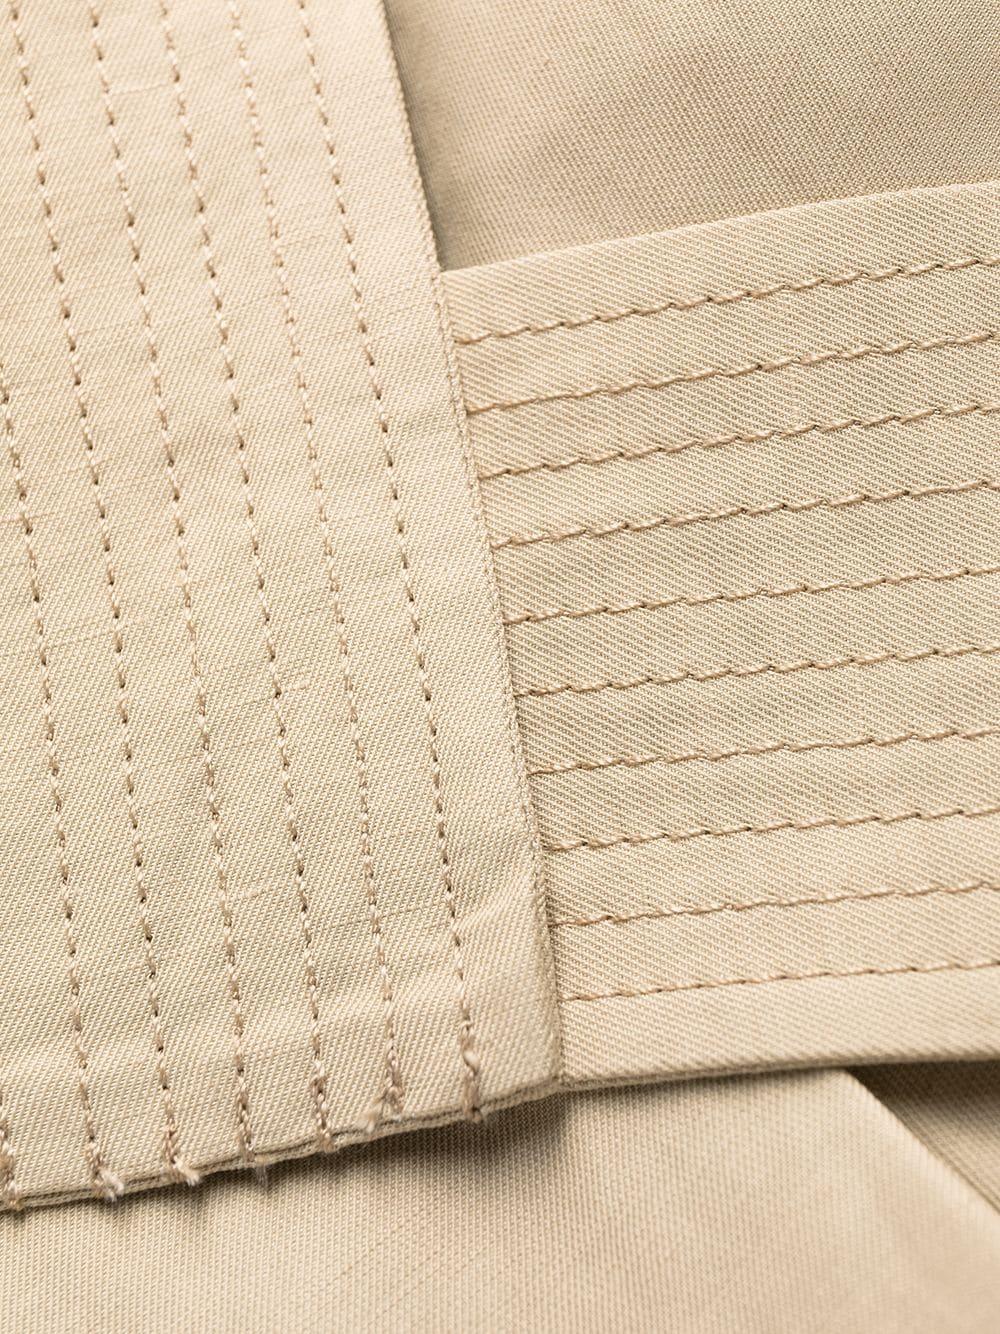 Pantaloncini a vita alta beige chiaro con cintura annodata P.A.R.O.S.H.   Shorts   D210080-RAISA004